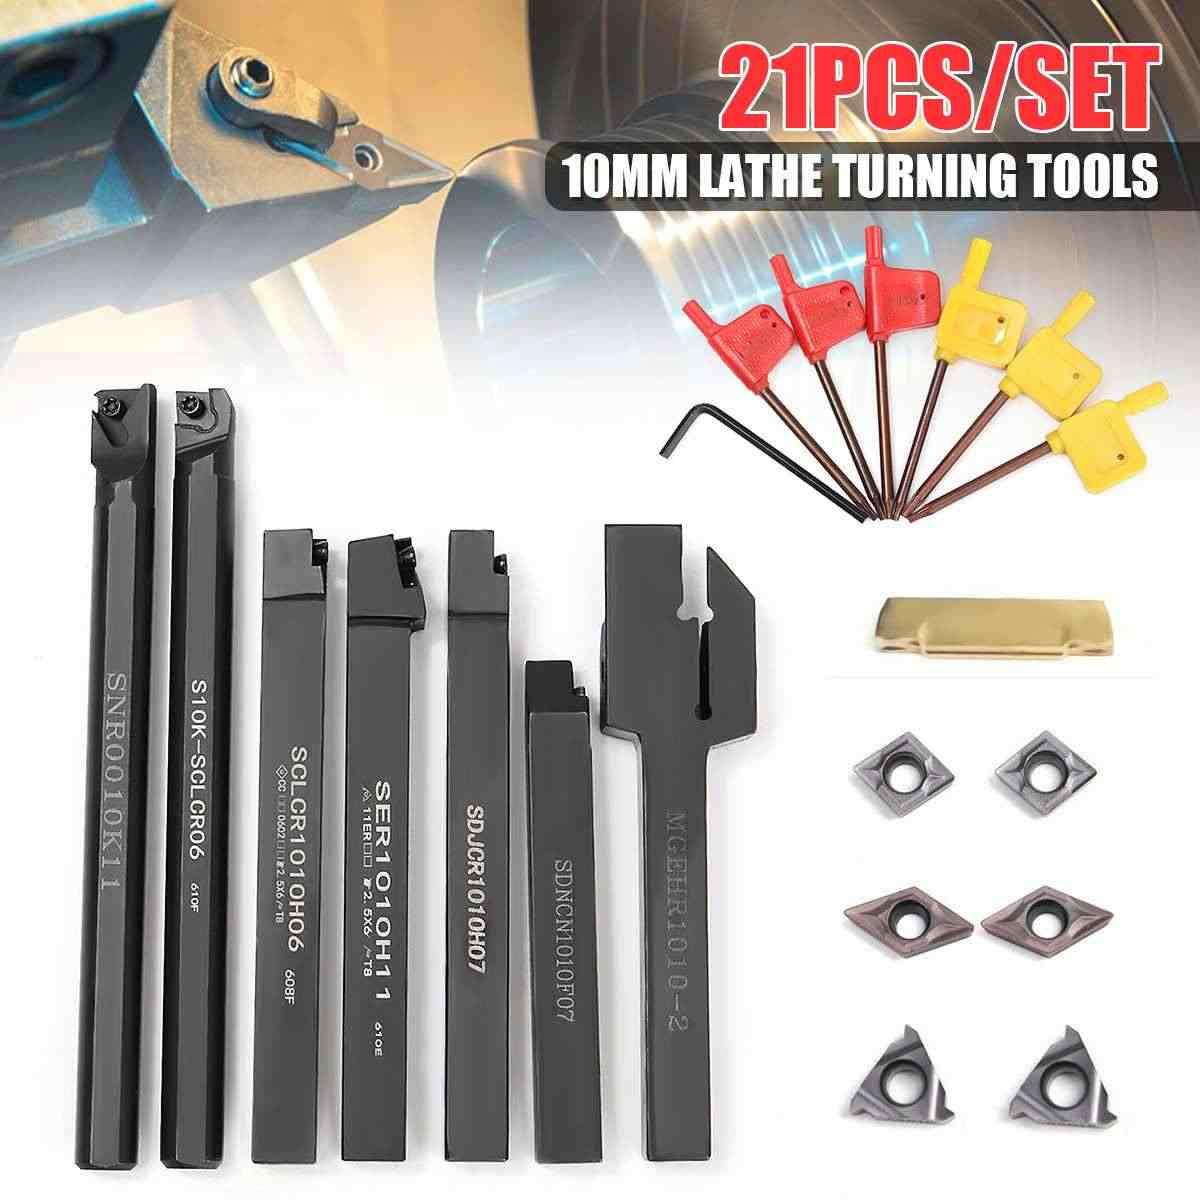 Carbide 7PCS Set Of 10MM Lathe Turning Tool Holder Boring Bar Wrench